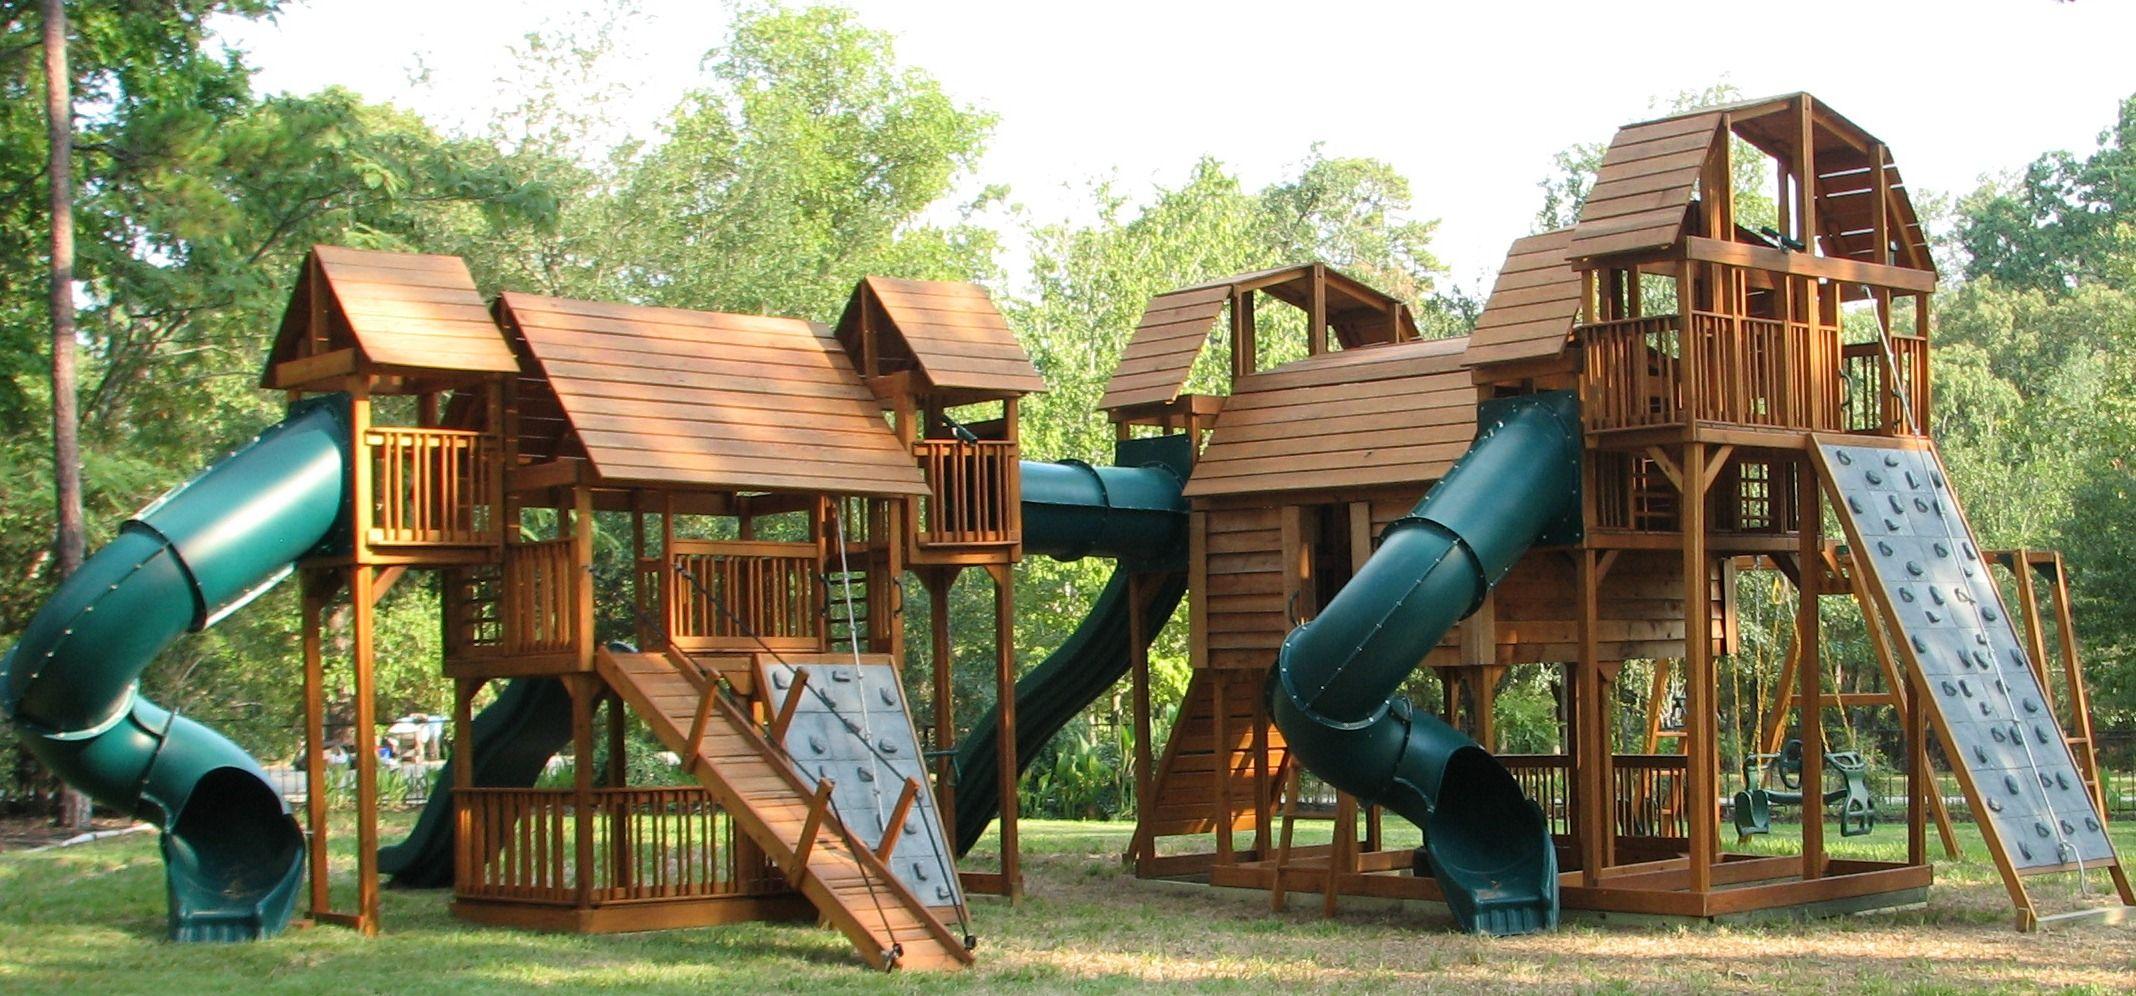 Pin by Andrew T. Lorigan on Garden ideas | Playground equipment, Home  playground equipment, Playground